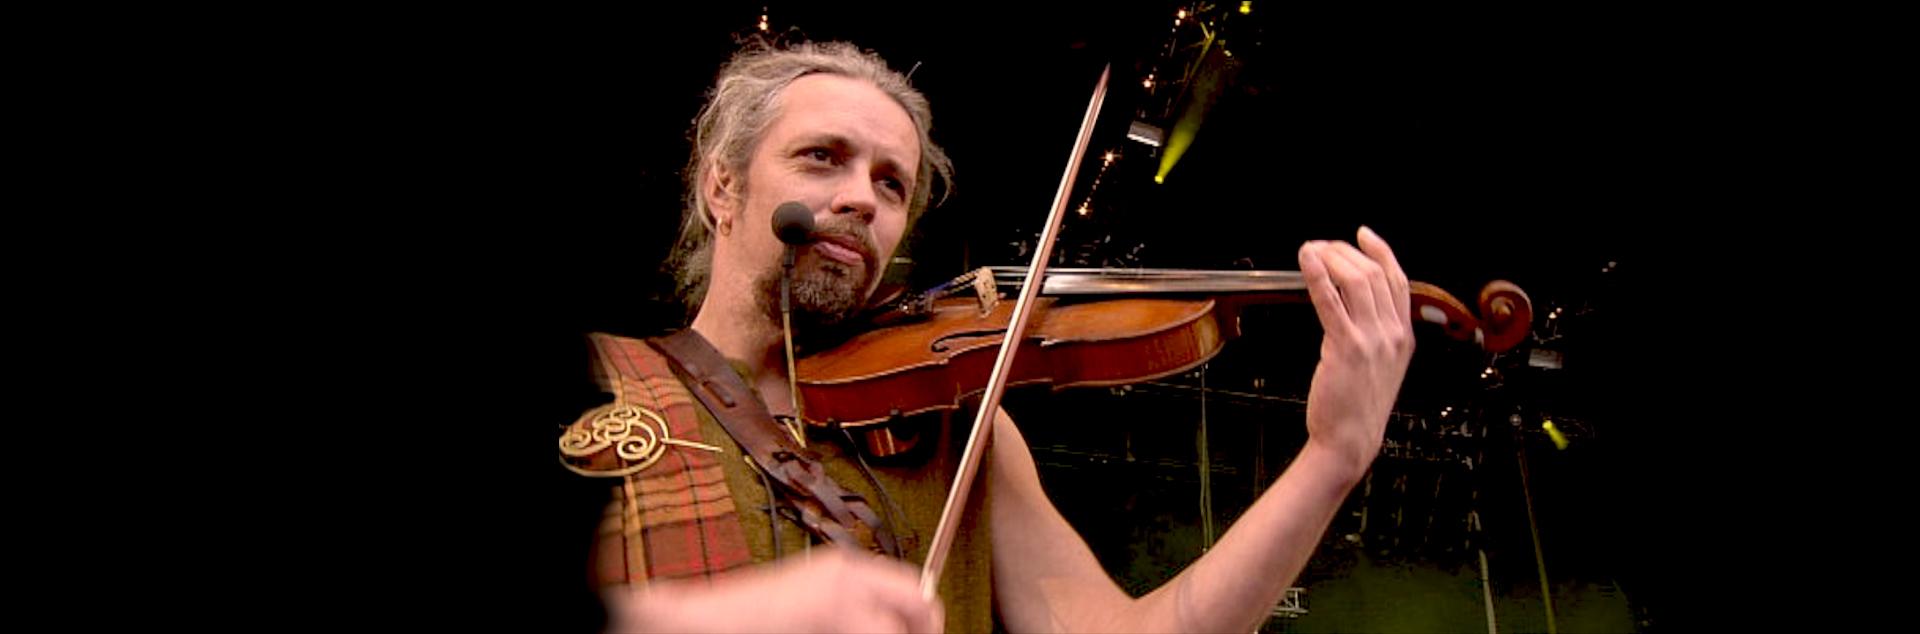 The-Raggle-Taggle-Gypsy-Bevrijdingsfestival-Overijssel-Zwolle---Celtic-Folk-Music-Live